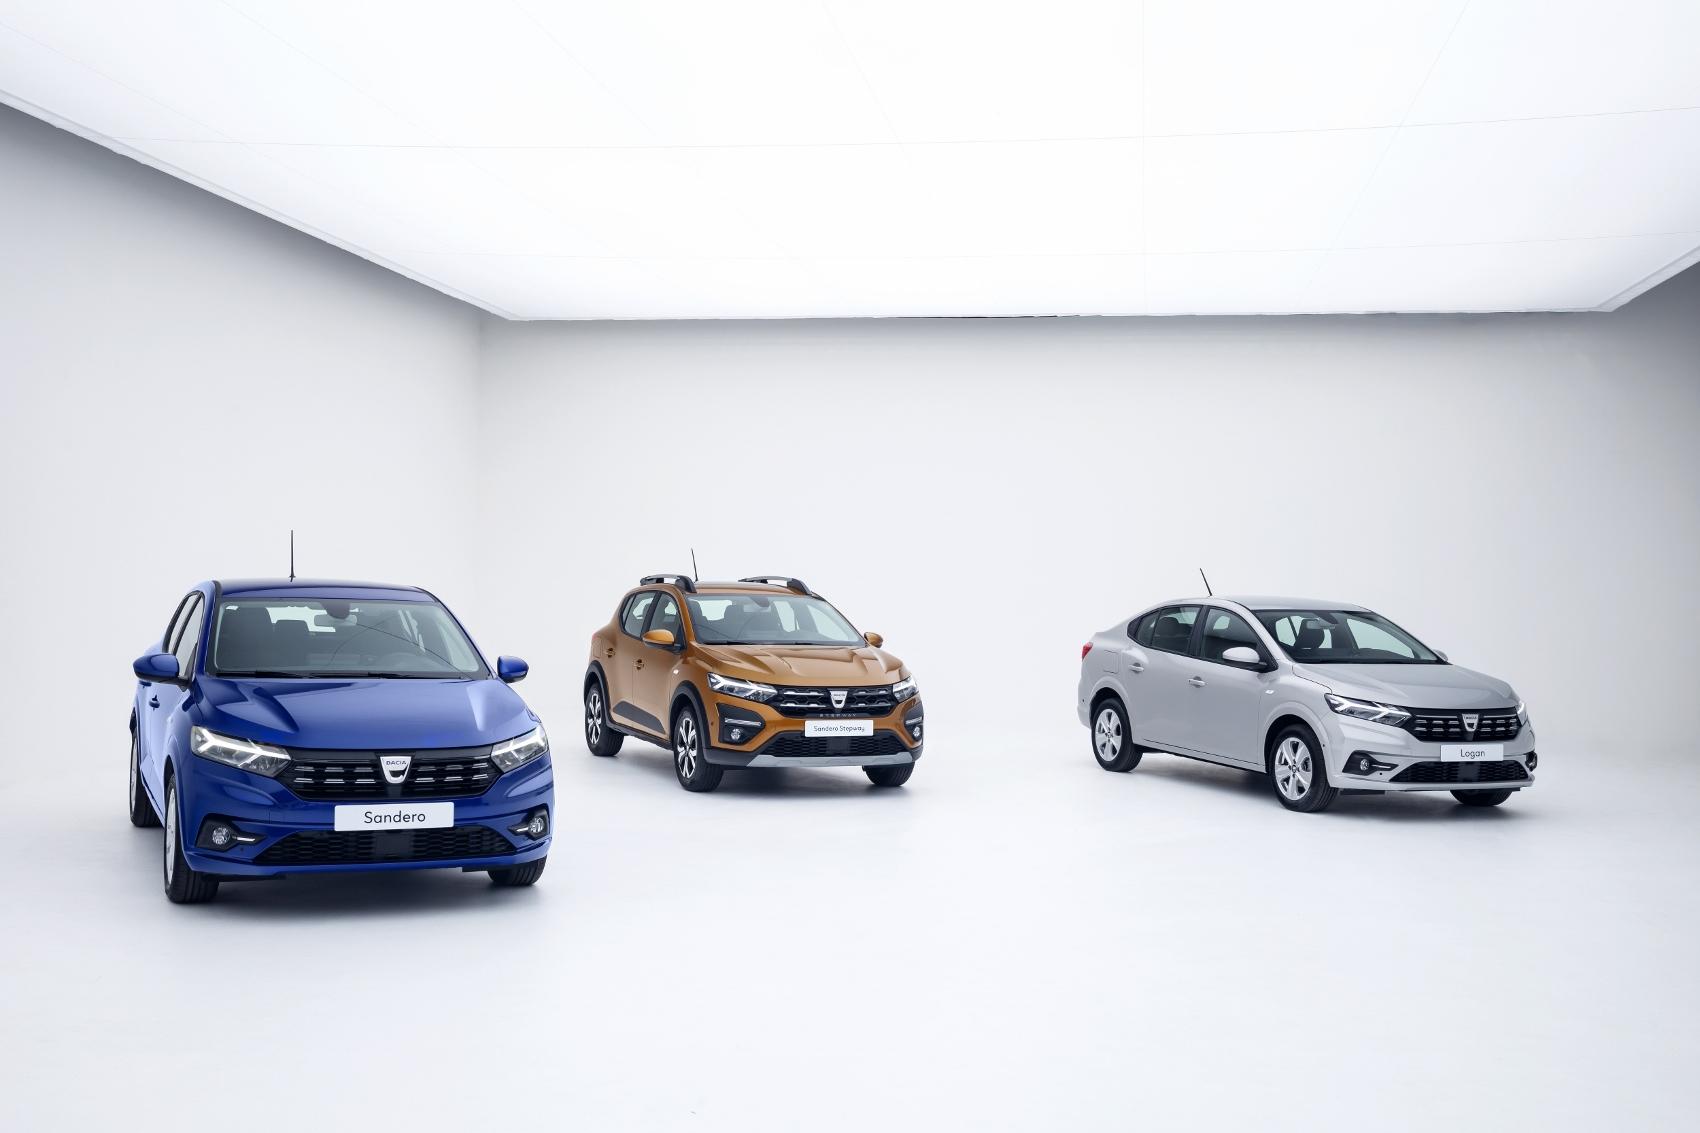 2020 - New Dacia Range (1700x1133)